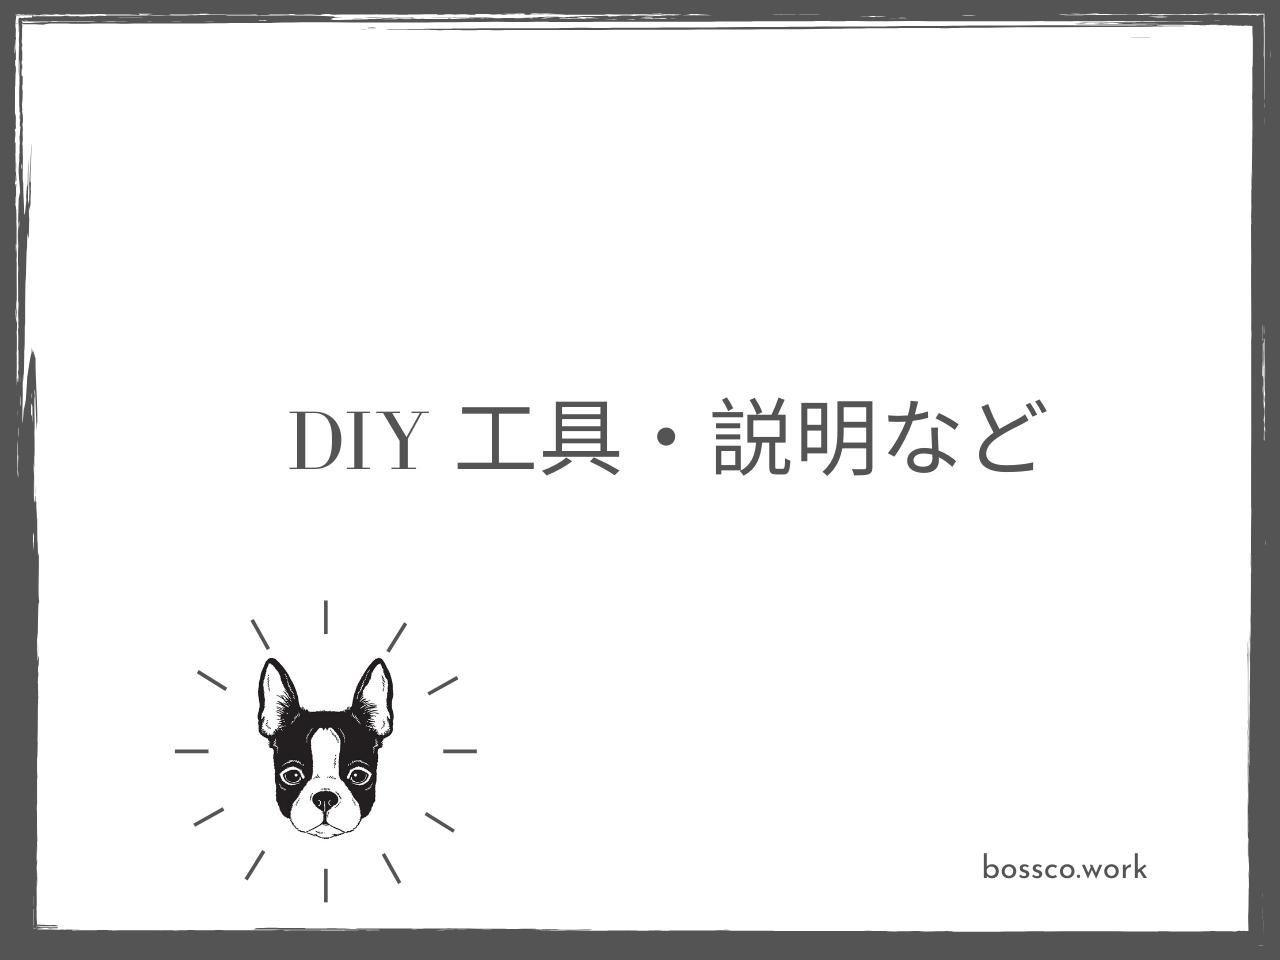 DIY工具・説明など